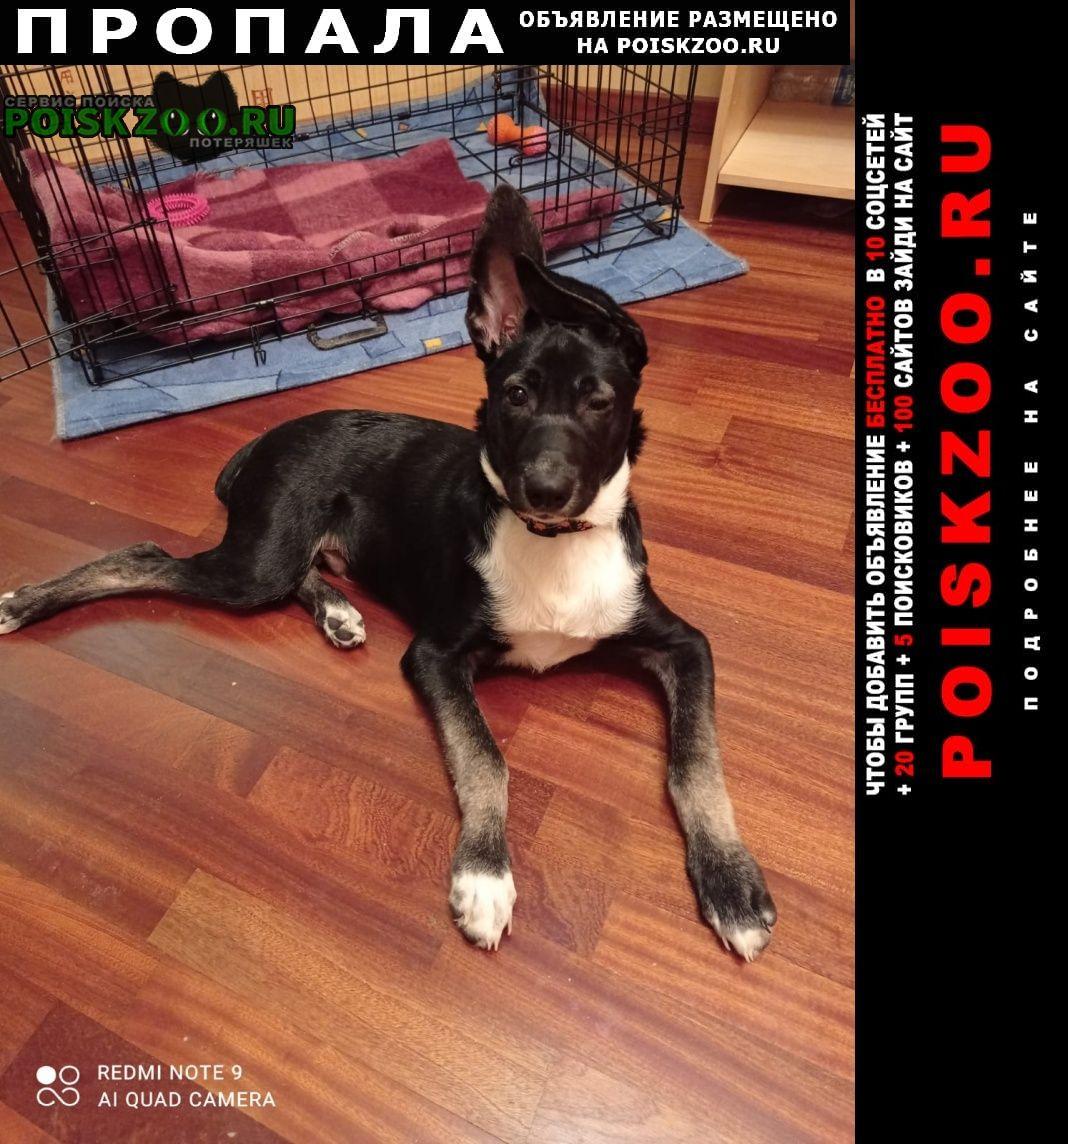 Пропала собака кобель убежала собака Москва